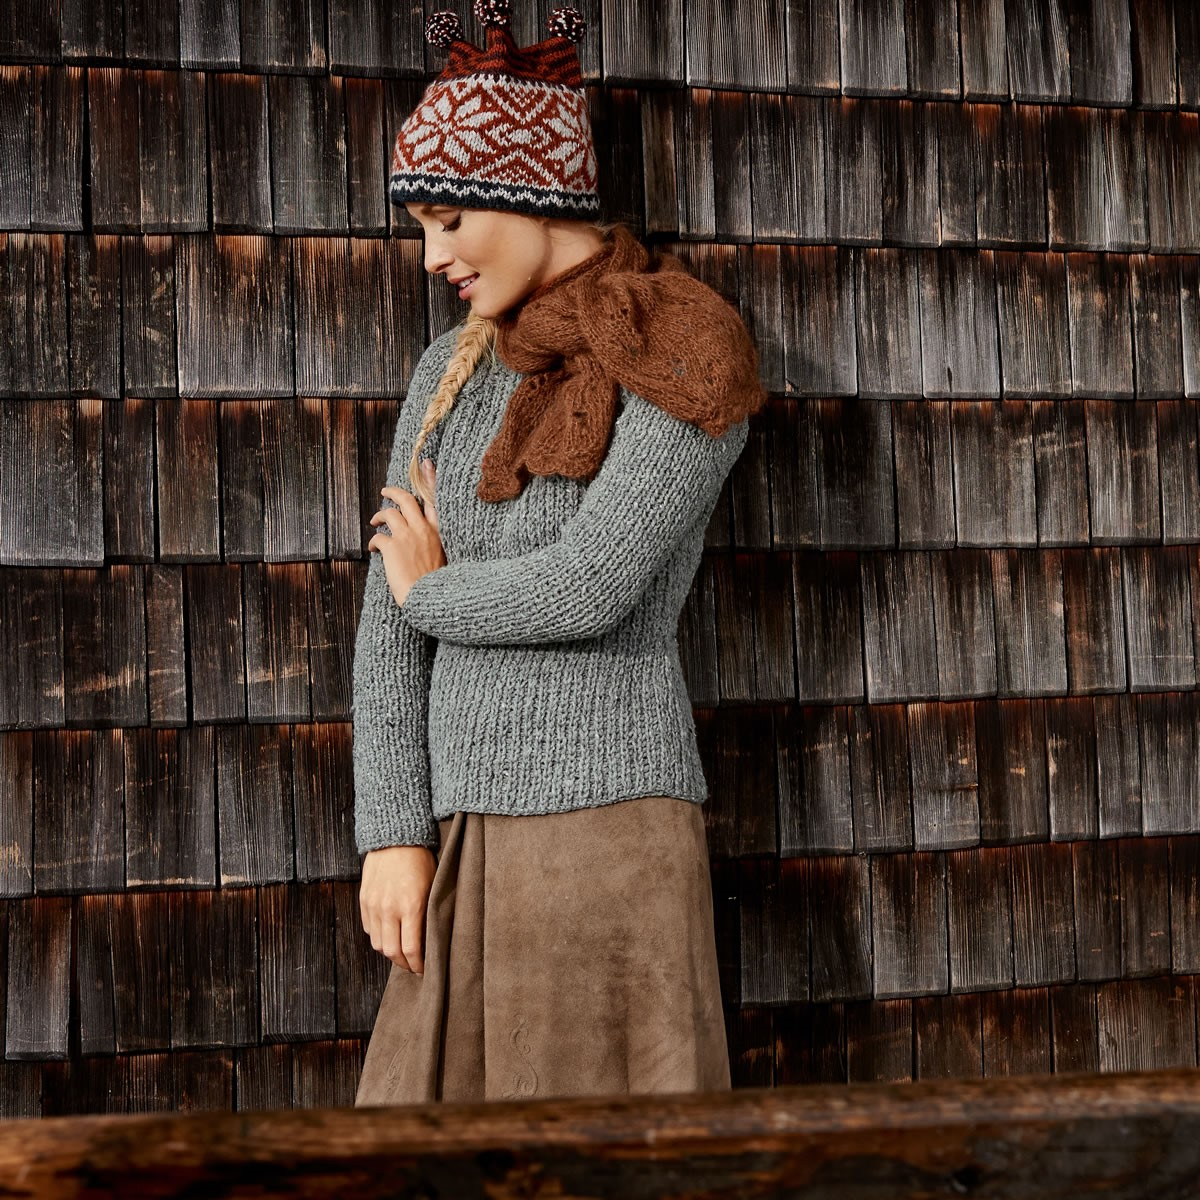 Lana Grossa Пуловер с косами по реглану Royal Tweed